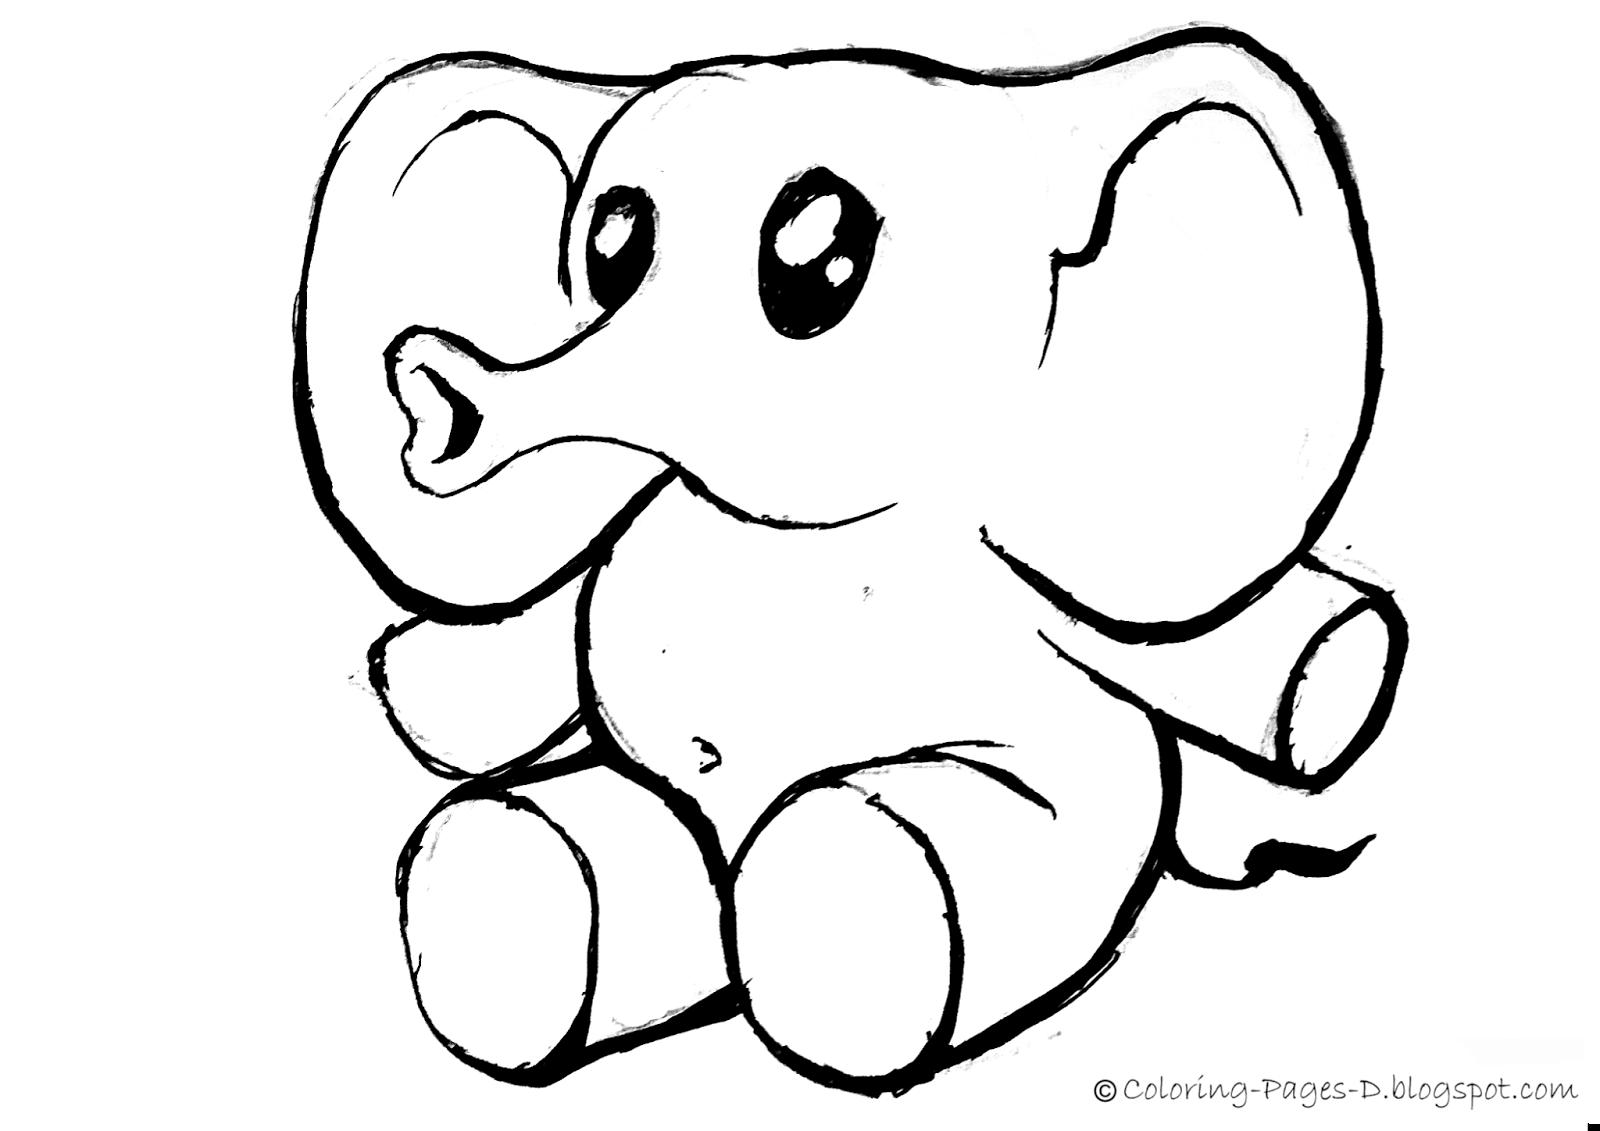 how to draw a simple elephant head